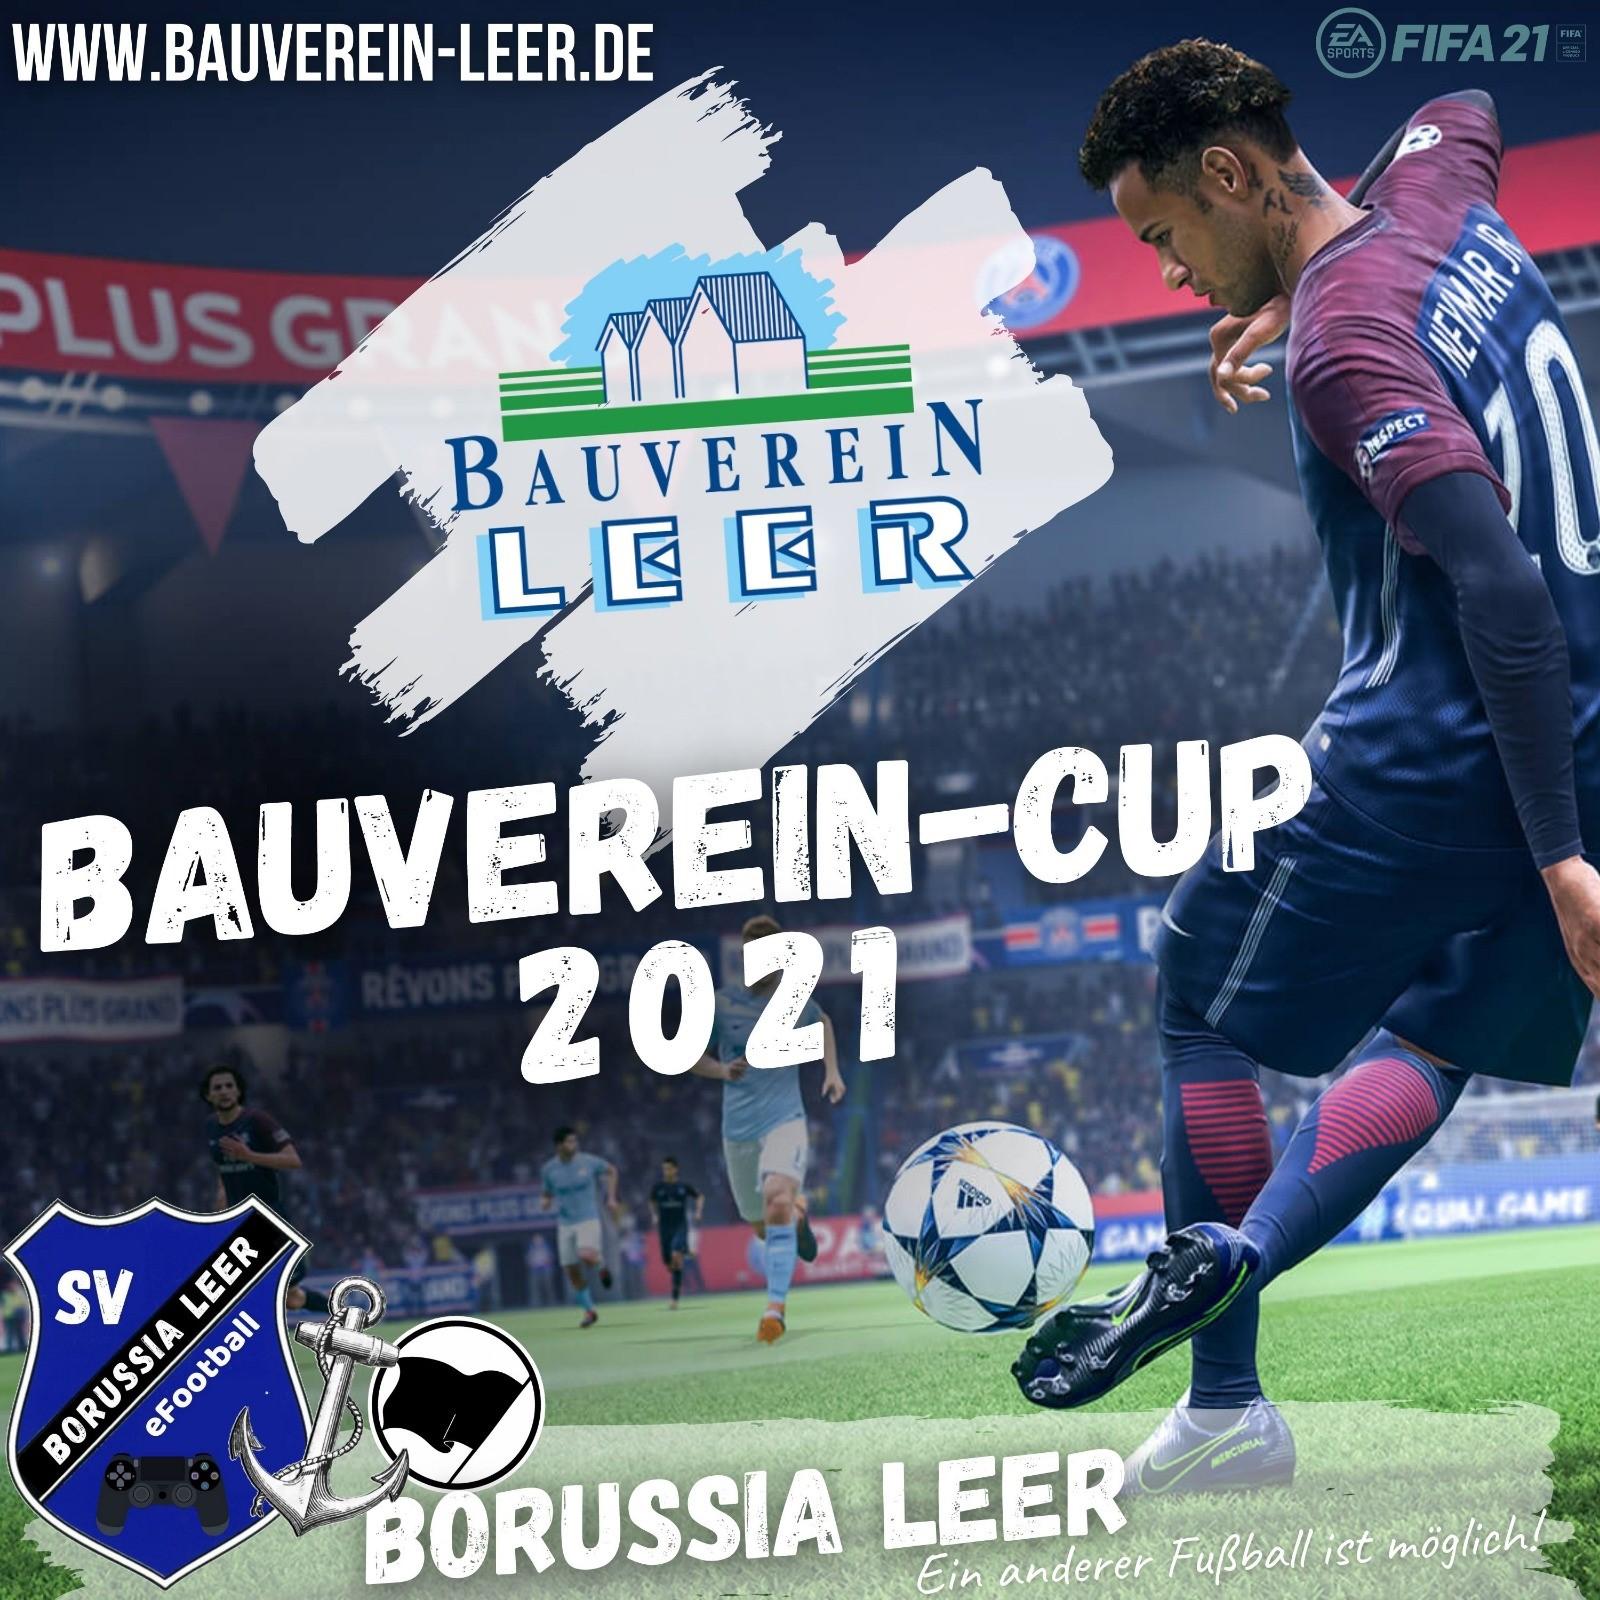 JFV Krummhörn siegt im Bauverein-Cup des SV Borussia Leer